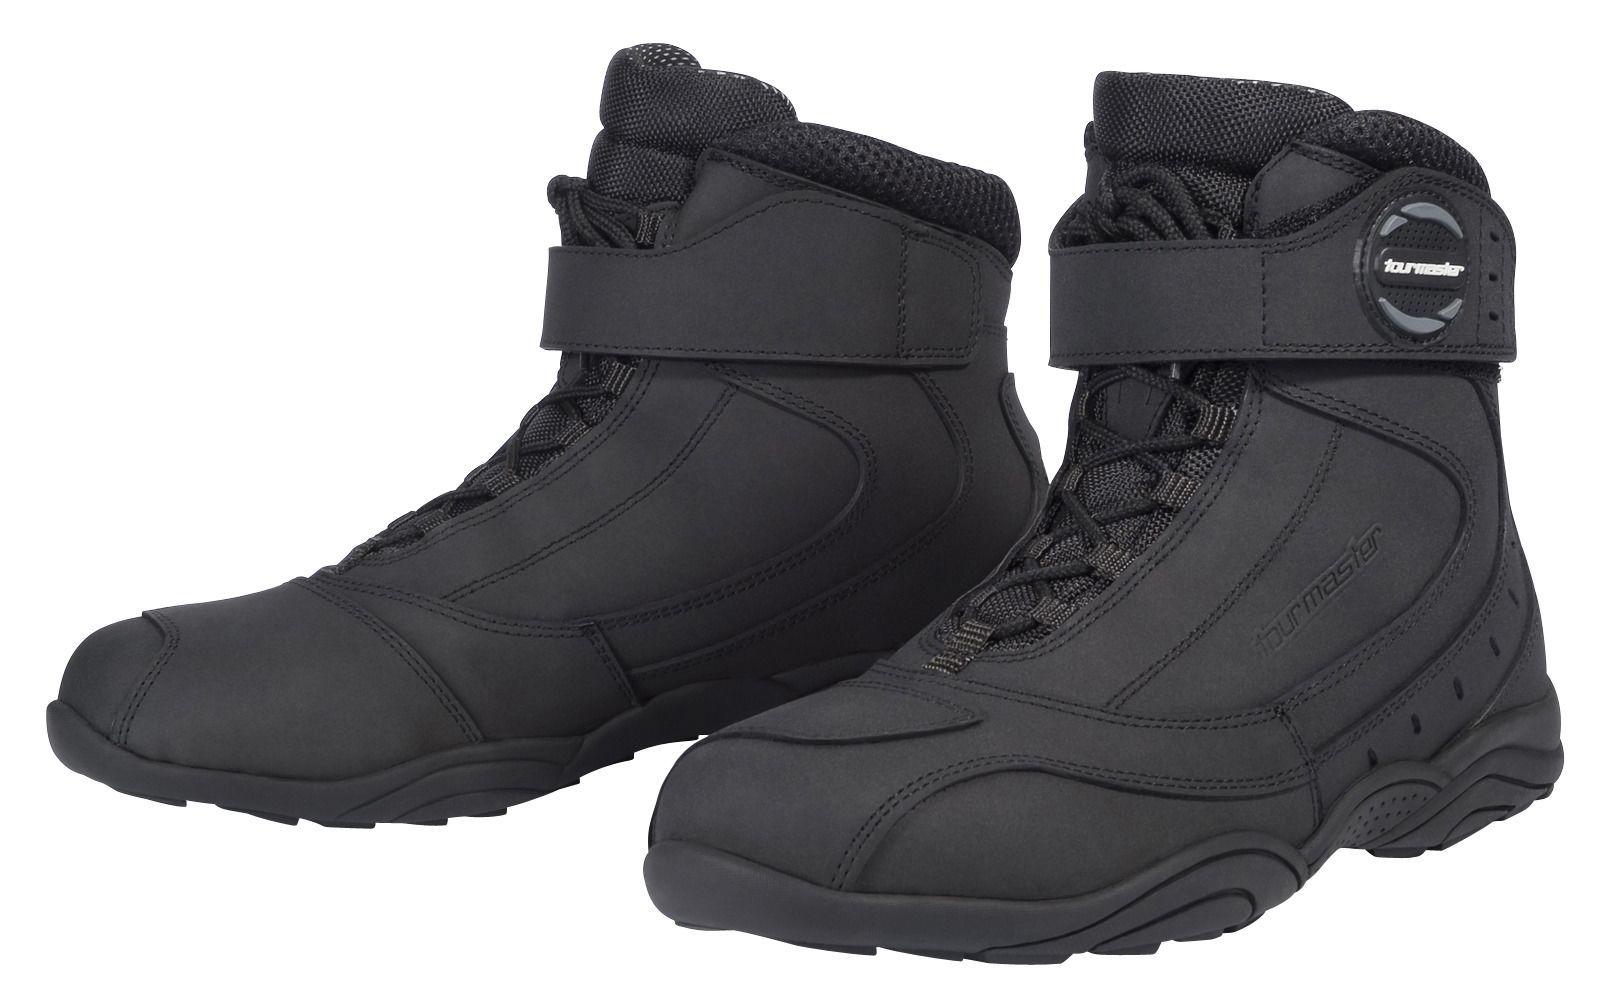 Icon Truant 2 Short Urban Motorcycle Boots Black